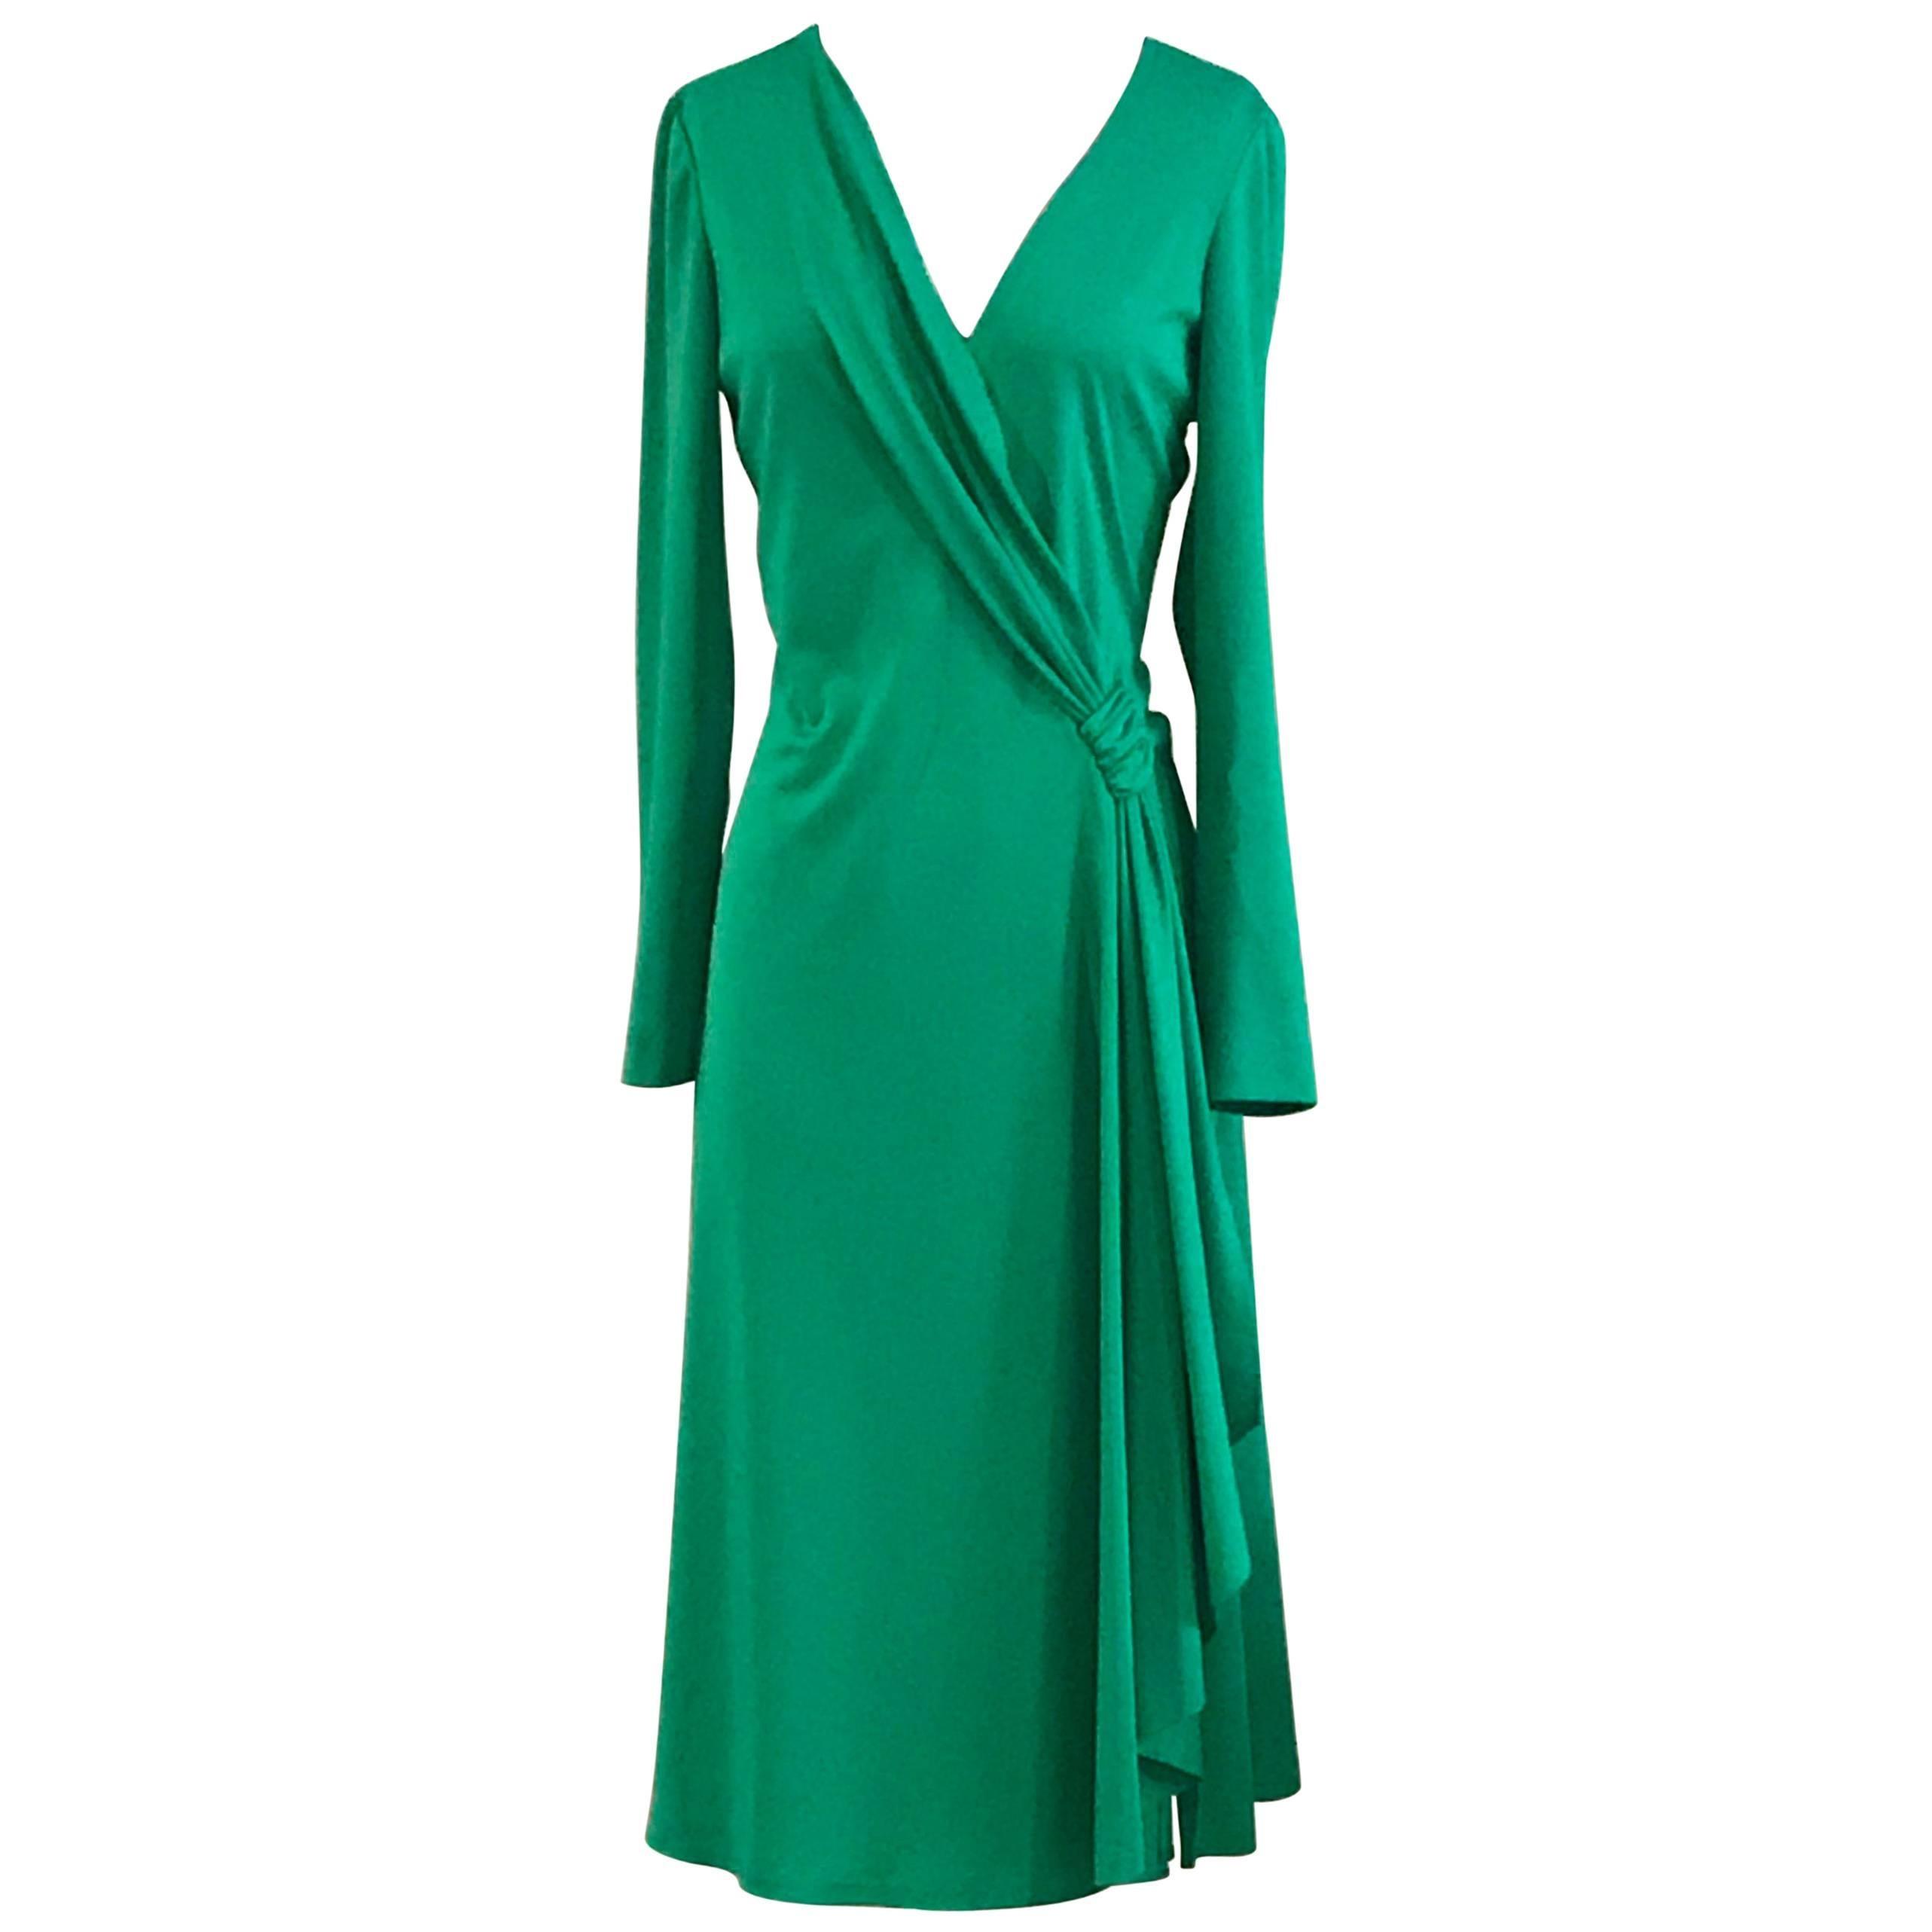 Stephen Burrows Green Draped Lettuce Edge Jersey Dress, 1970s